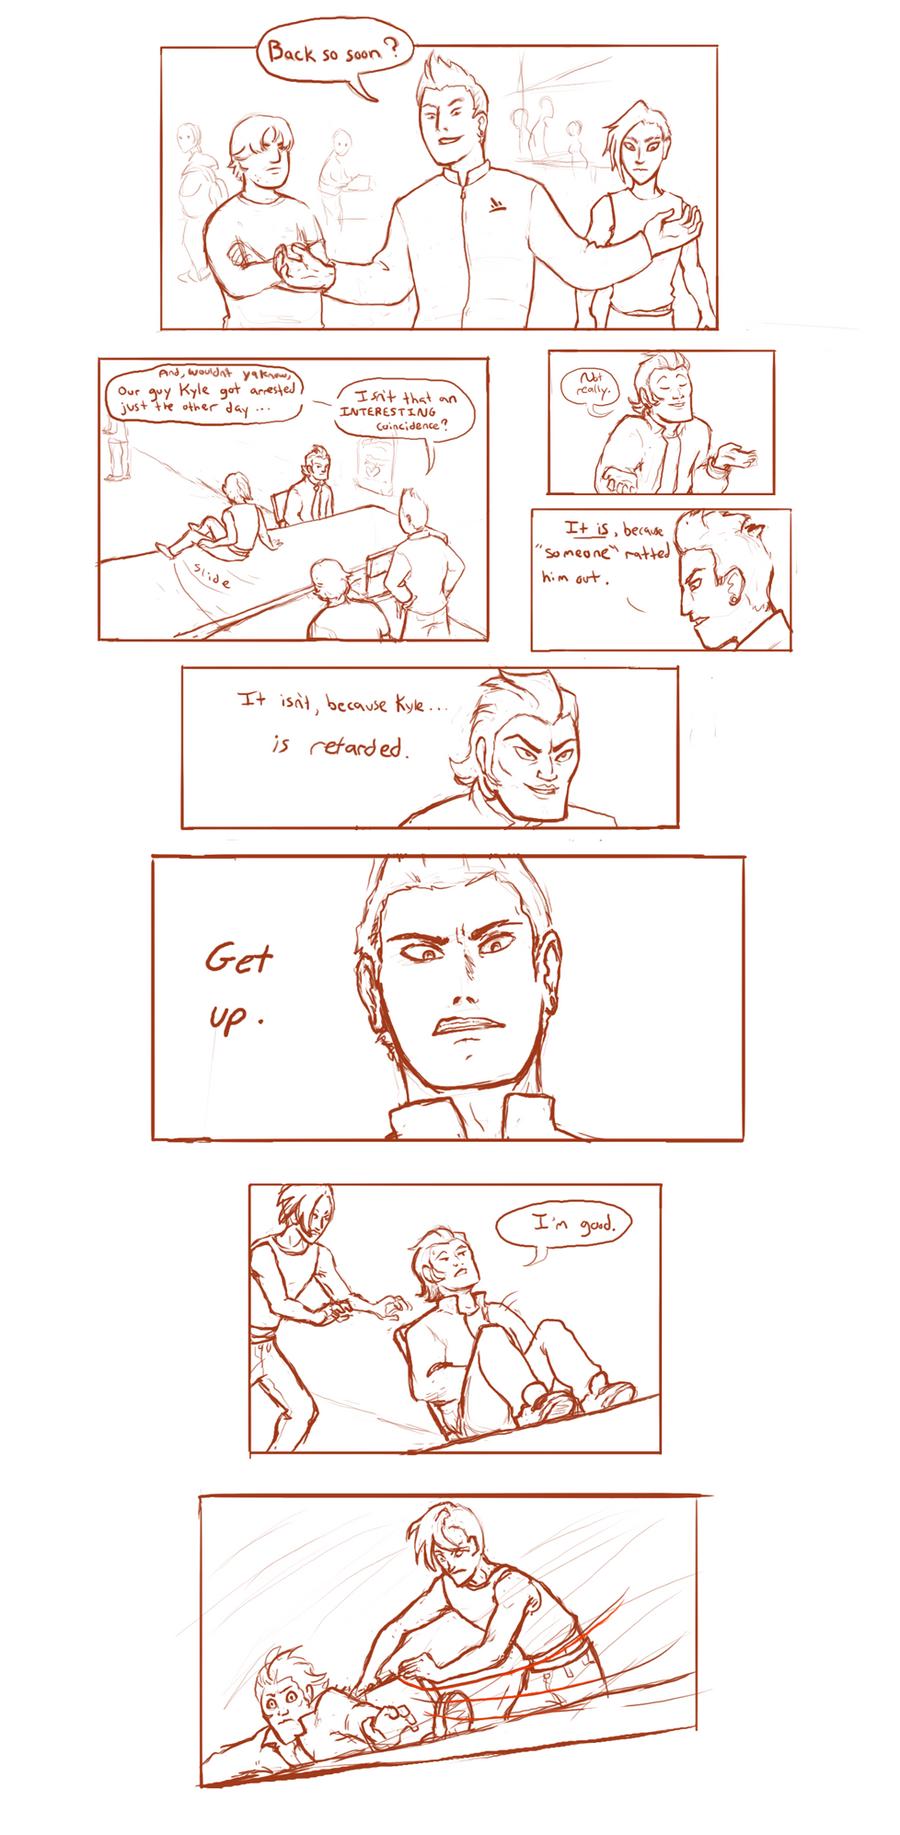 SBT comic 3 by PaintedYoko